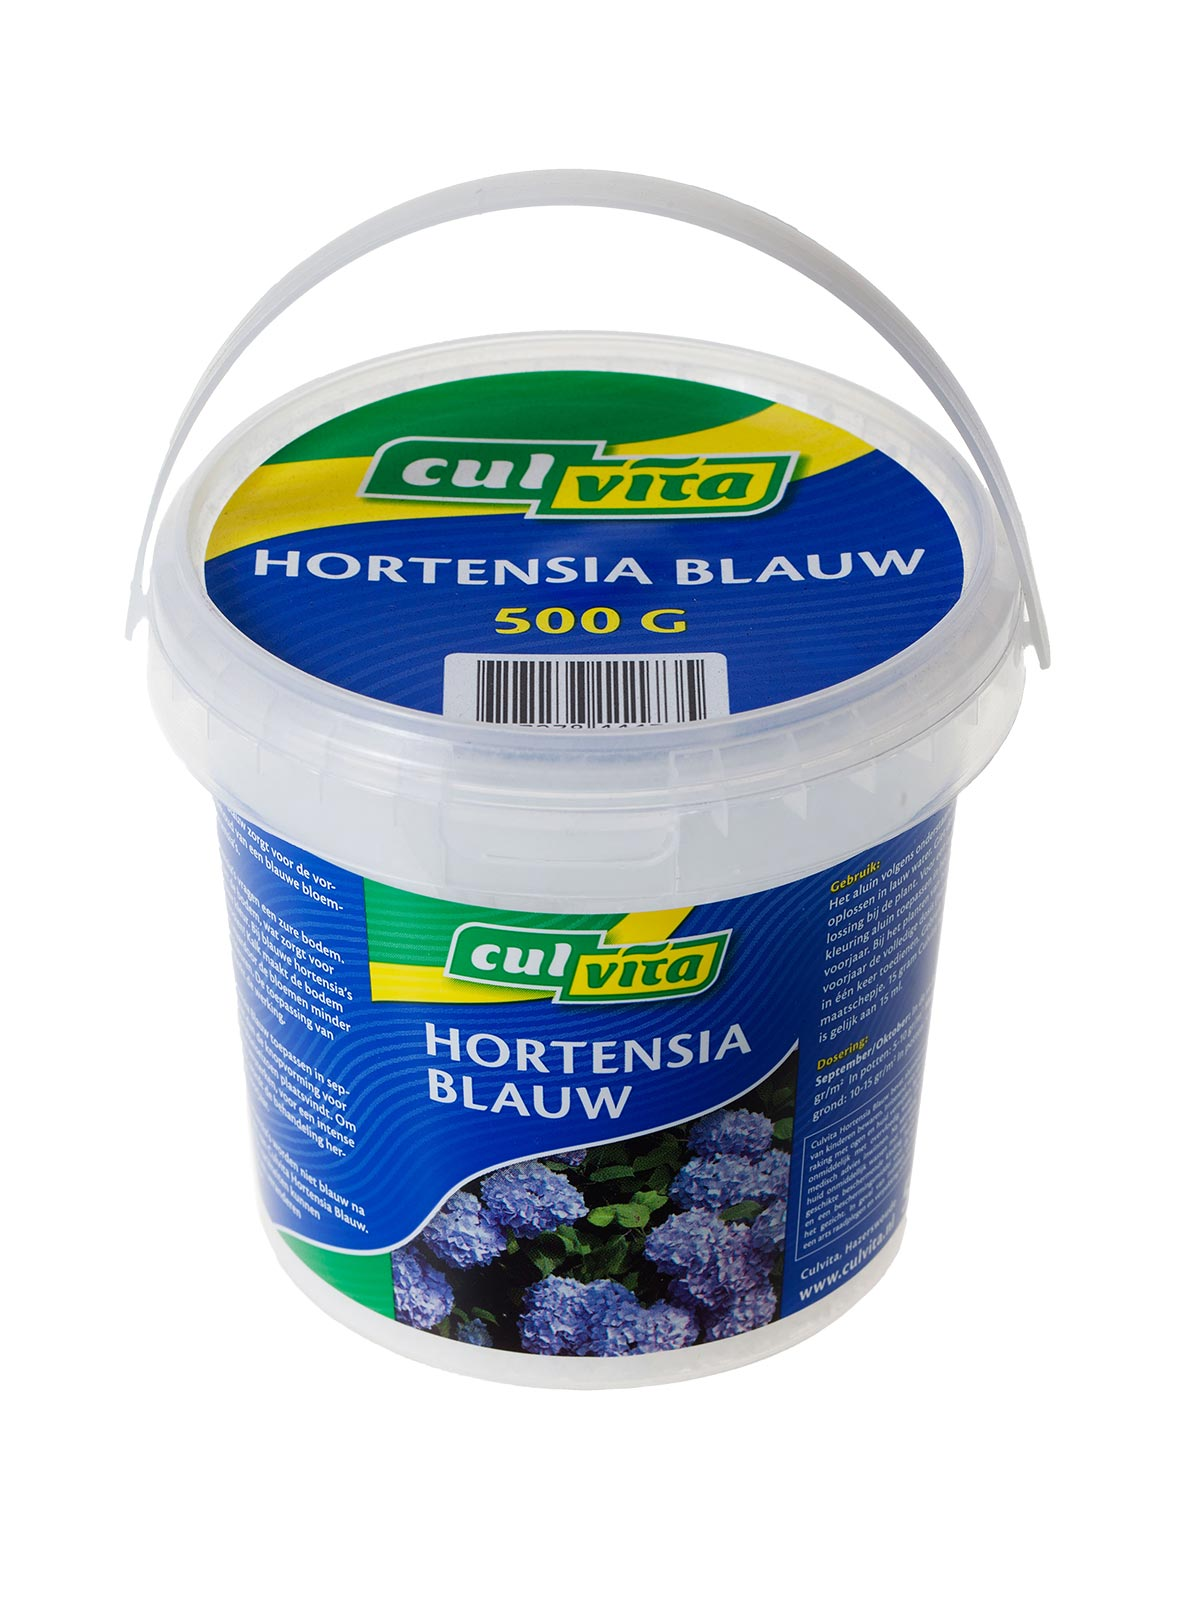 Culvita Hortensia Blauw | Culvita.nl